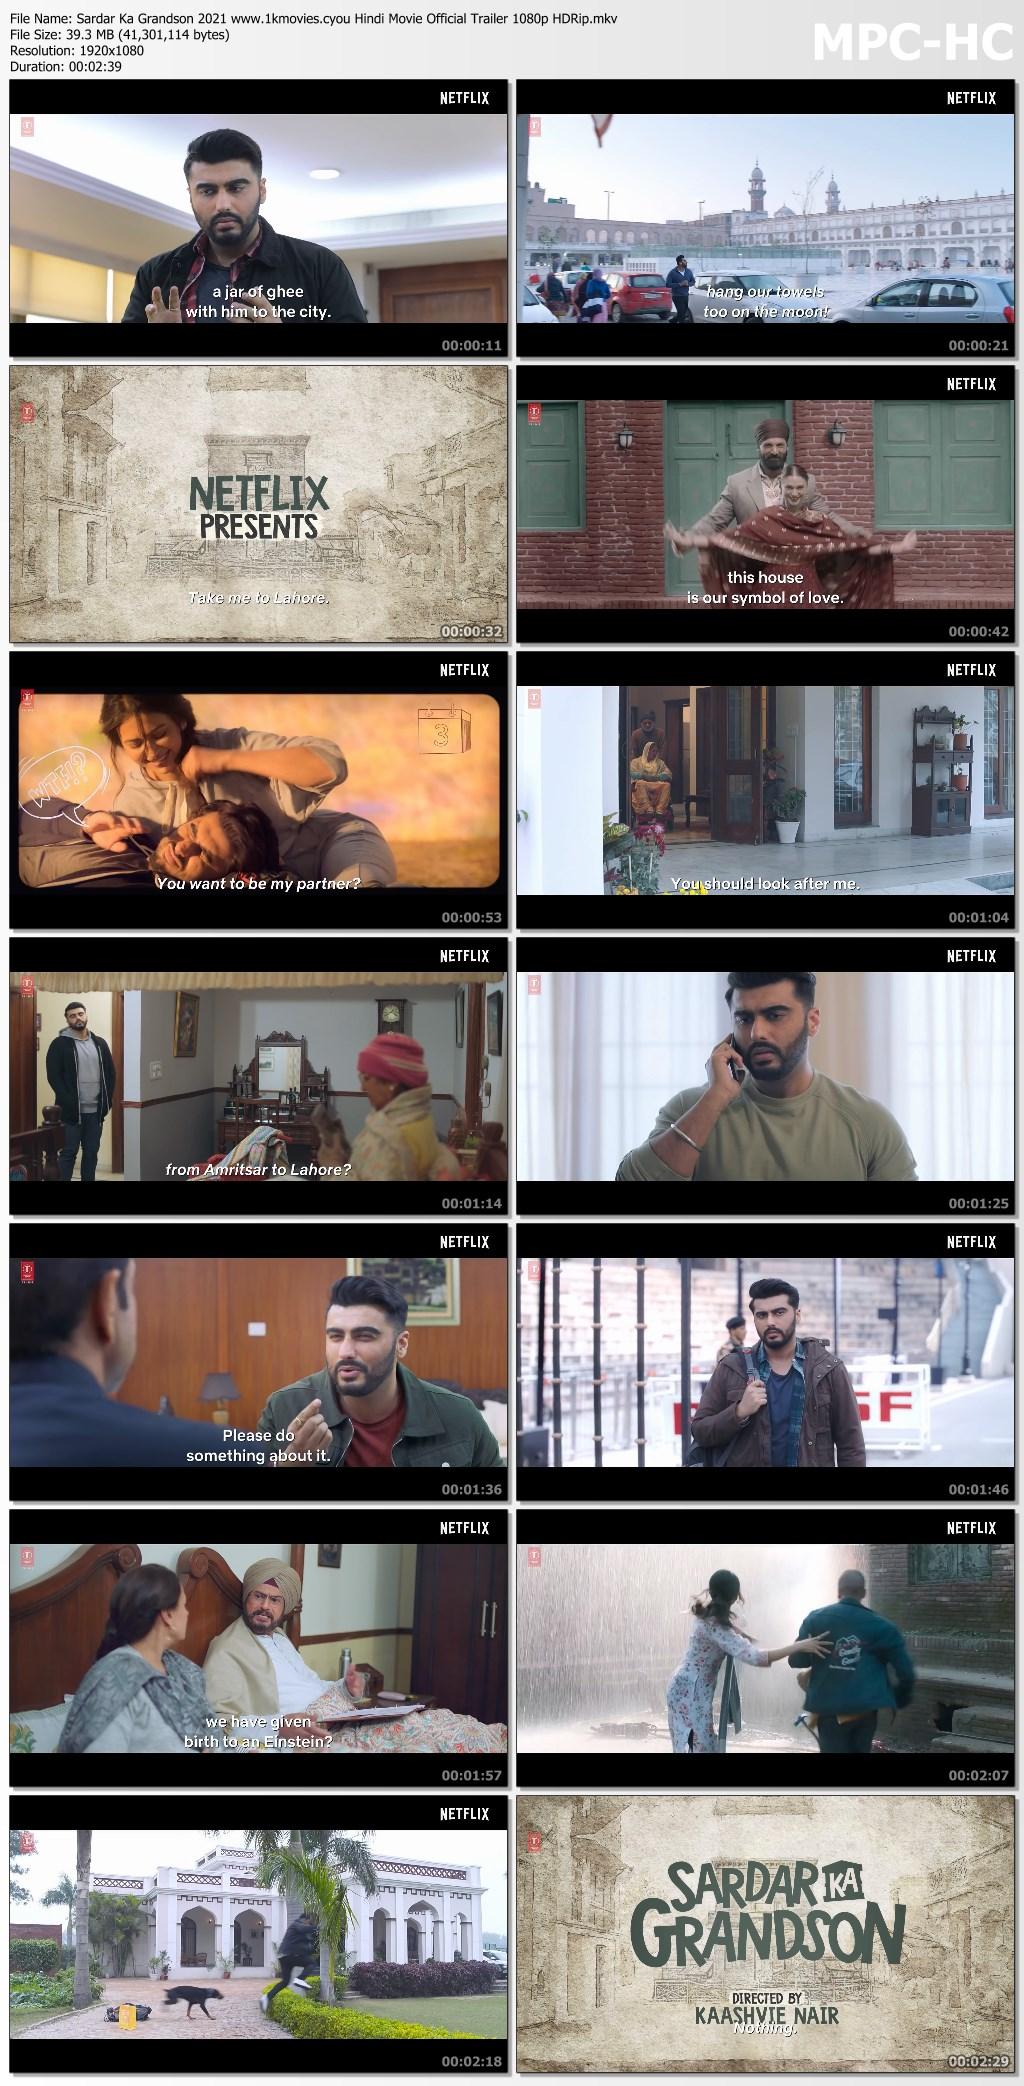 Sardar Ka Grandson 2021 screenshot HDMoviesFair